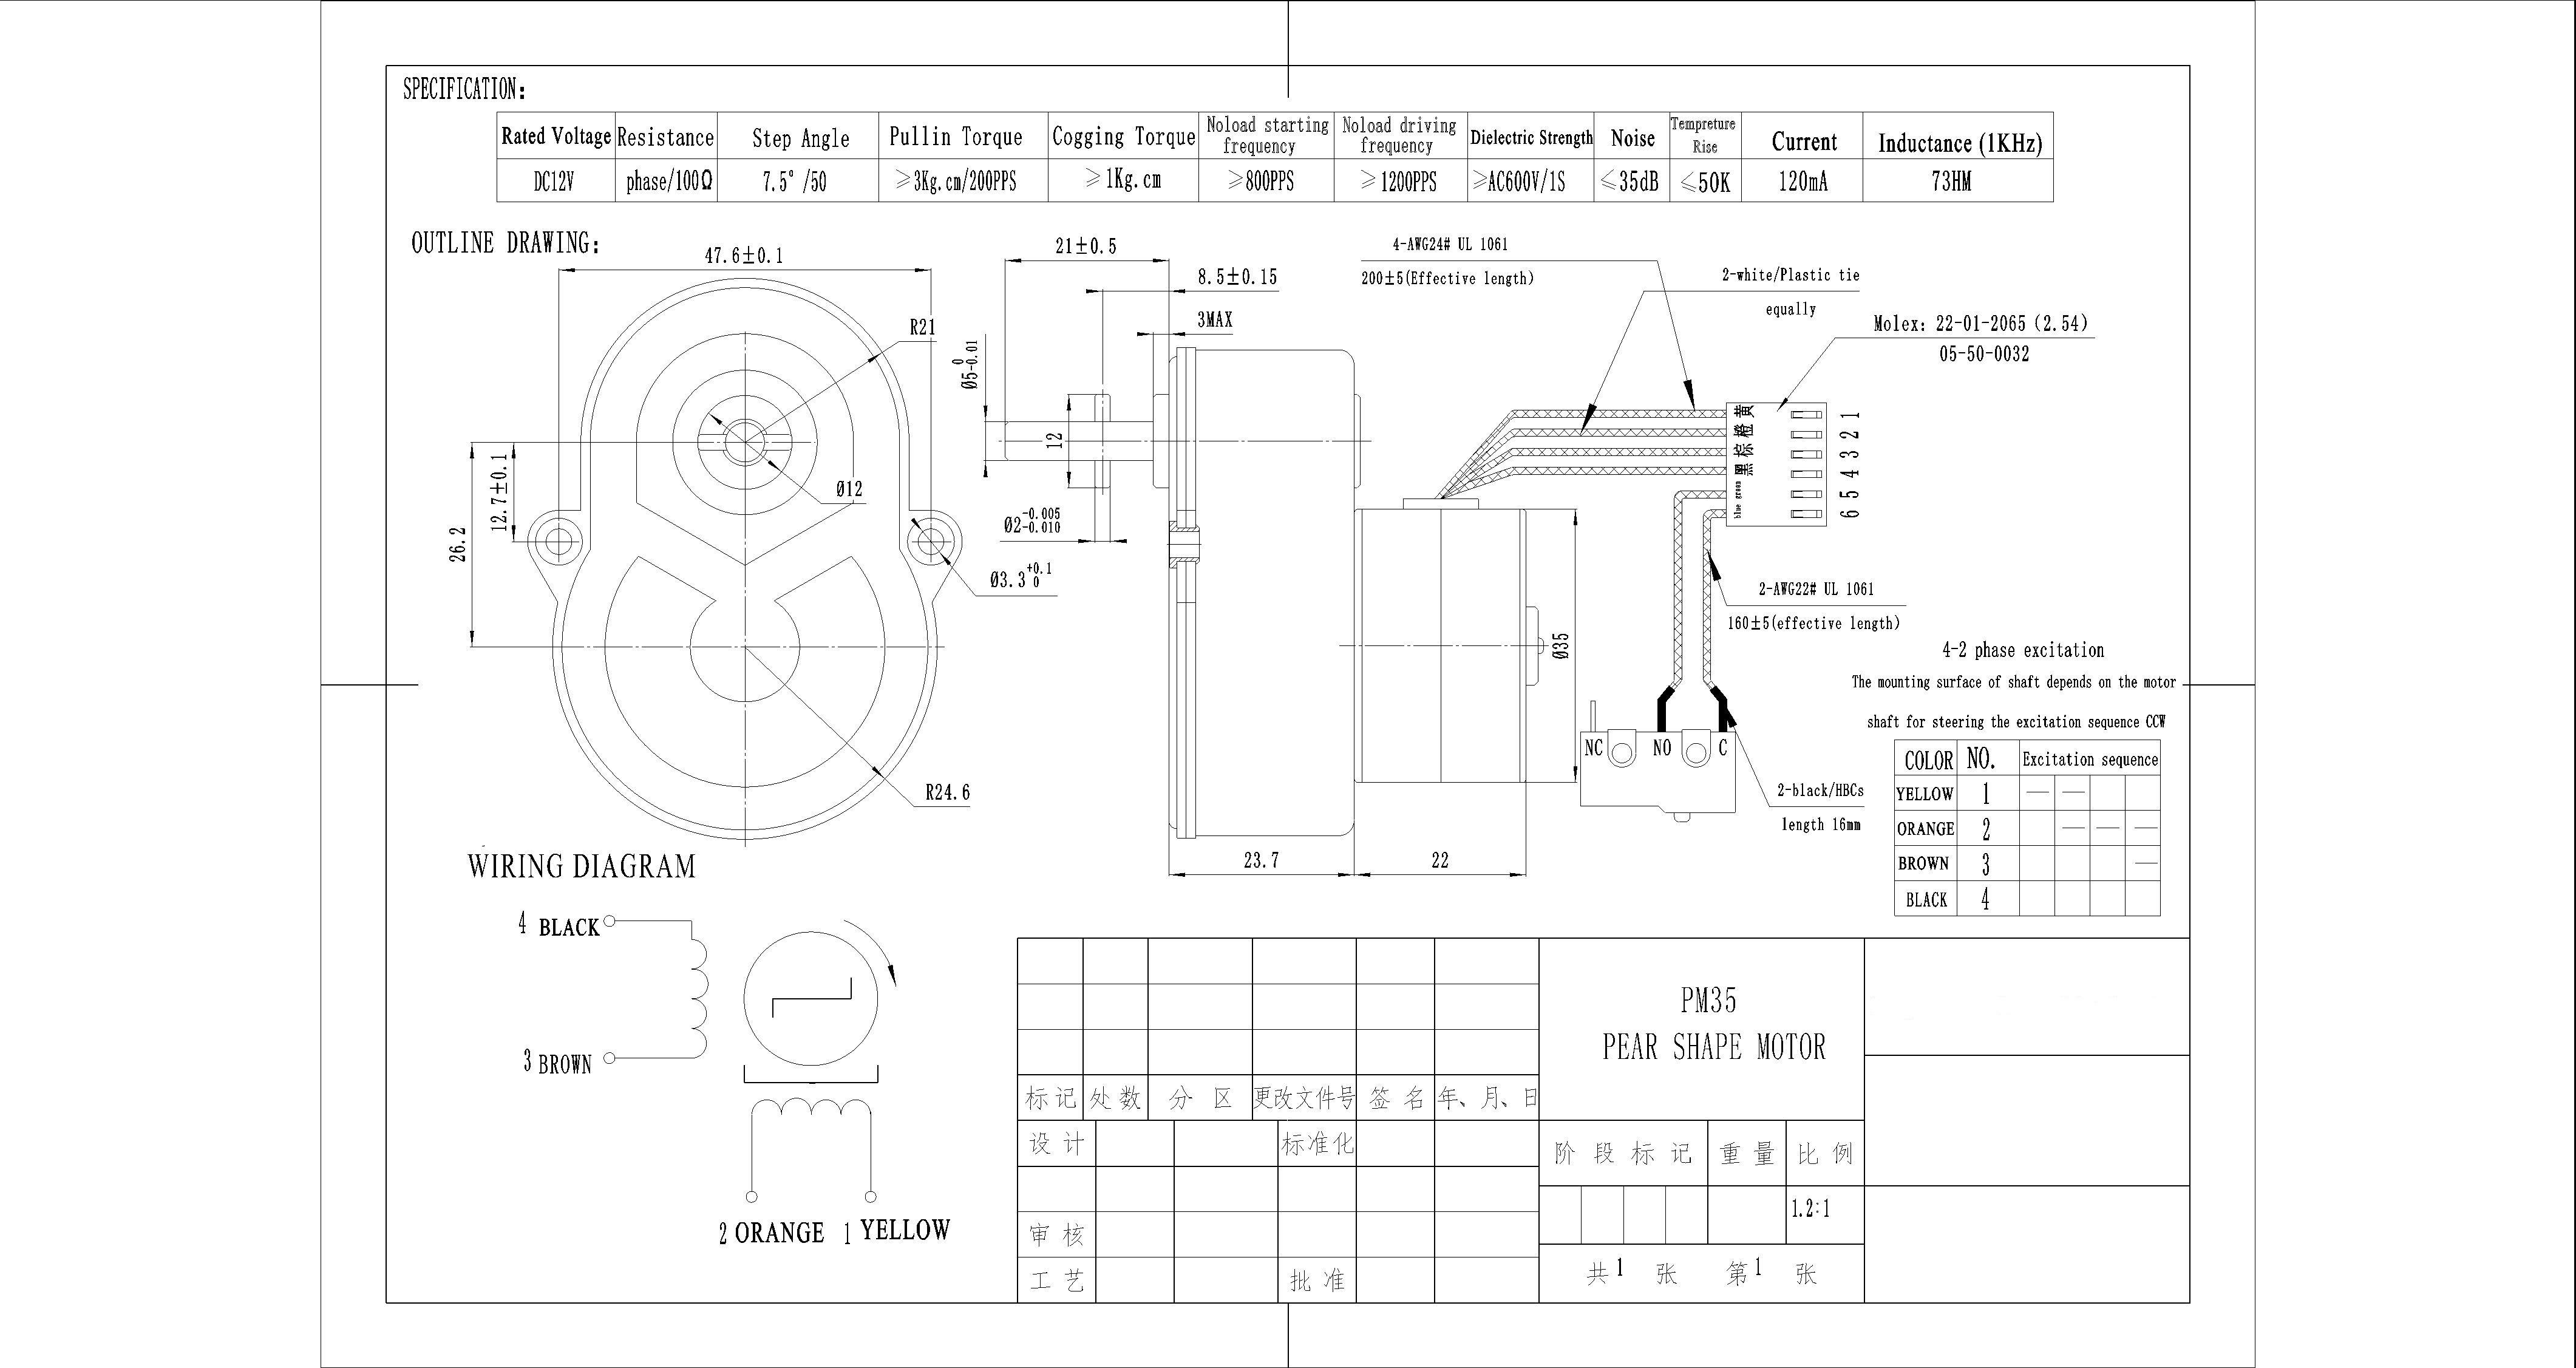 Brushless Dc Motor Diagram Pear Shape Stepping Brushless Dc Gear Motor 12 Volt Dc Of Brushless Dc Motor Diagram